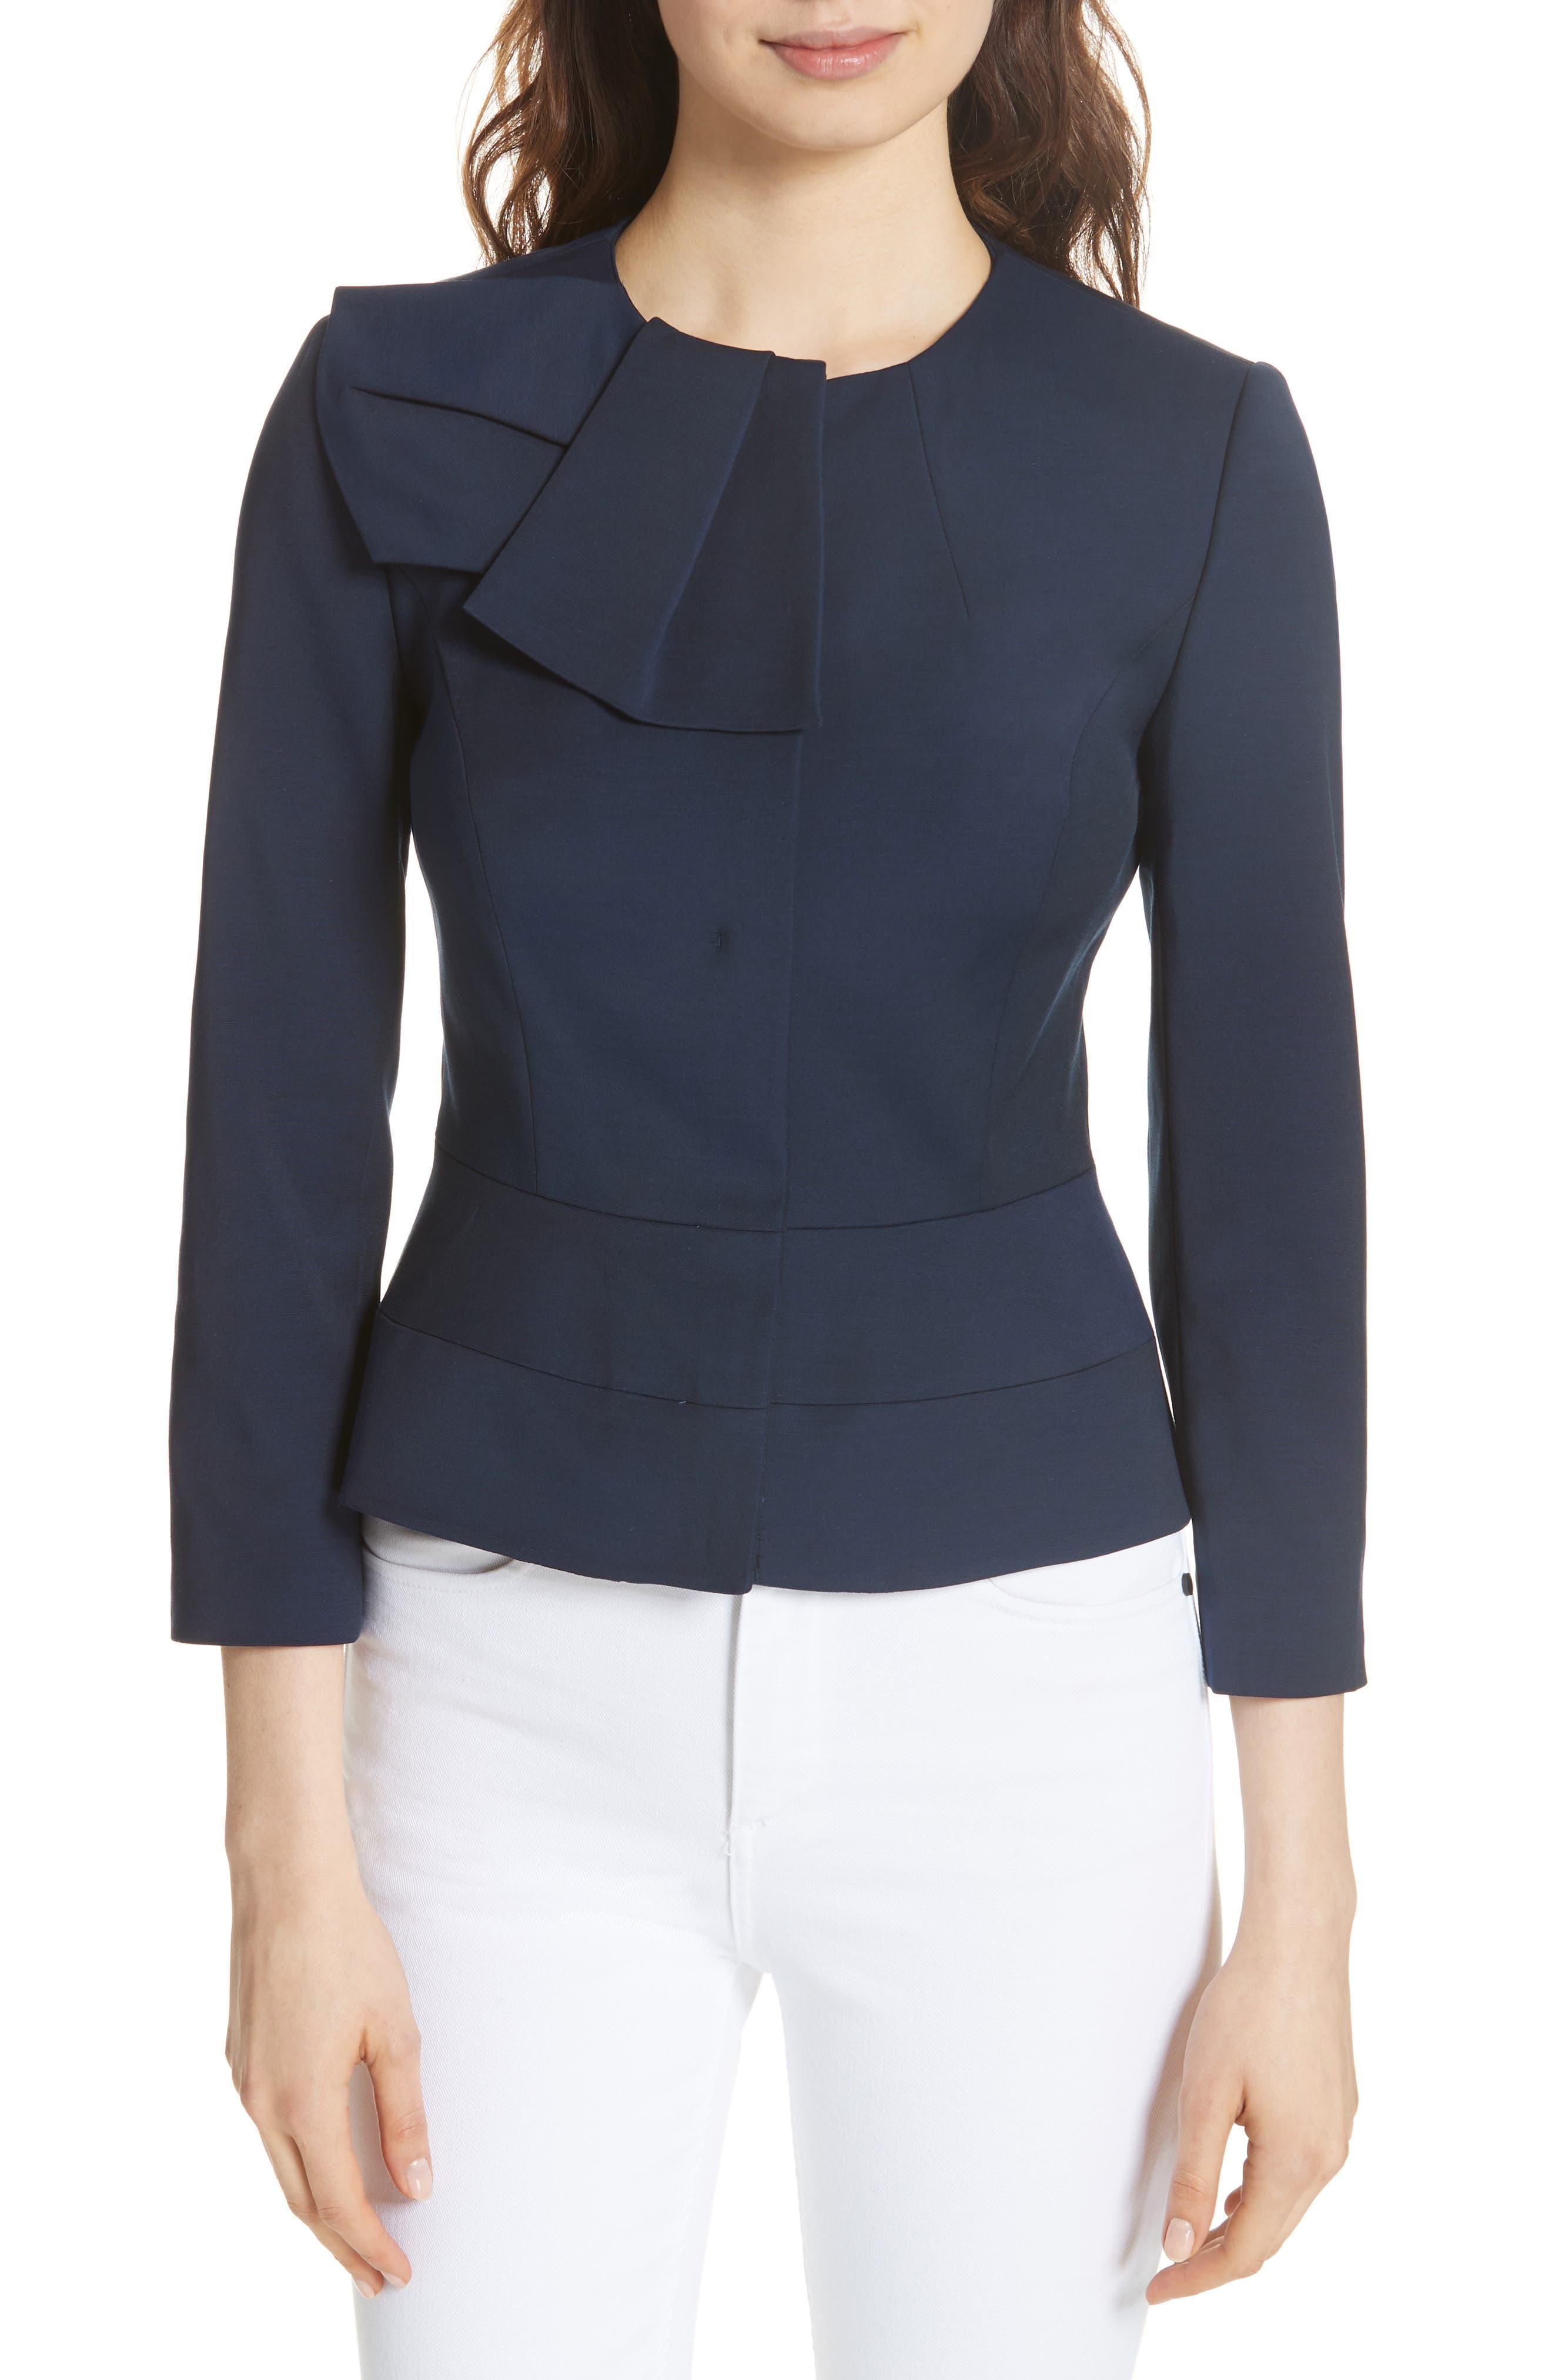 Rayal Bow Neck Peplum Jacket,                         Main,                         color, Dark Blue